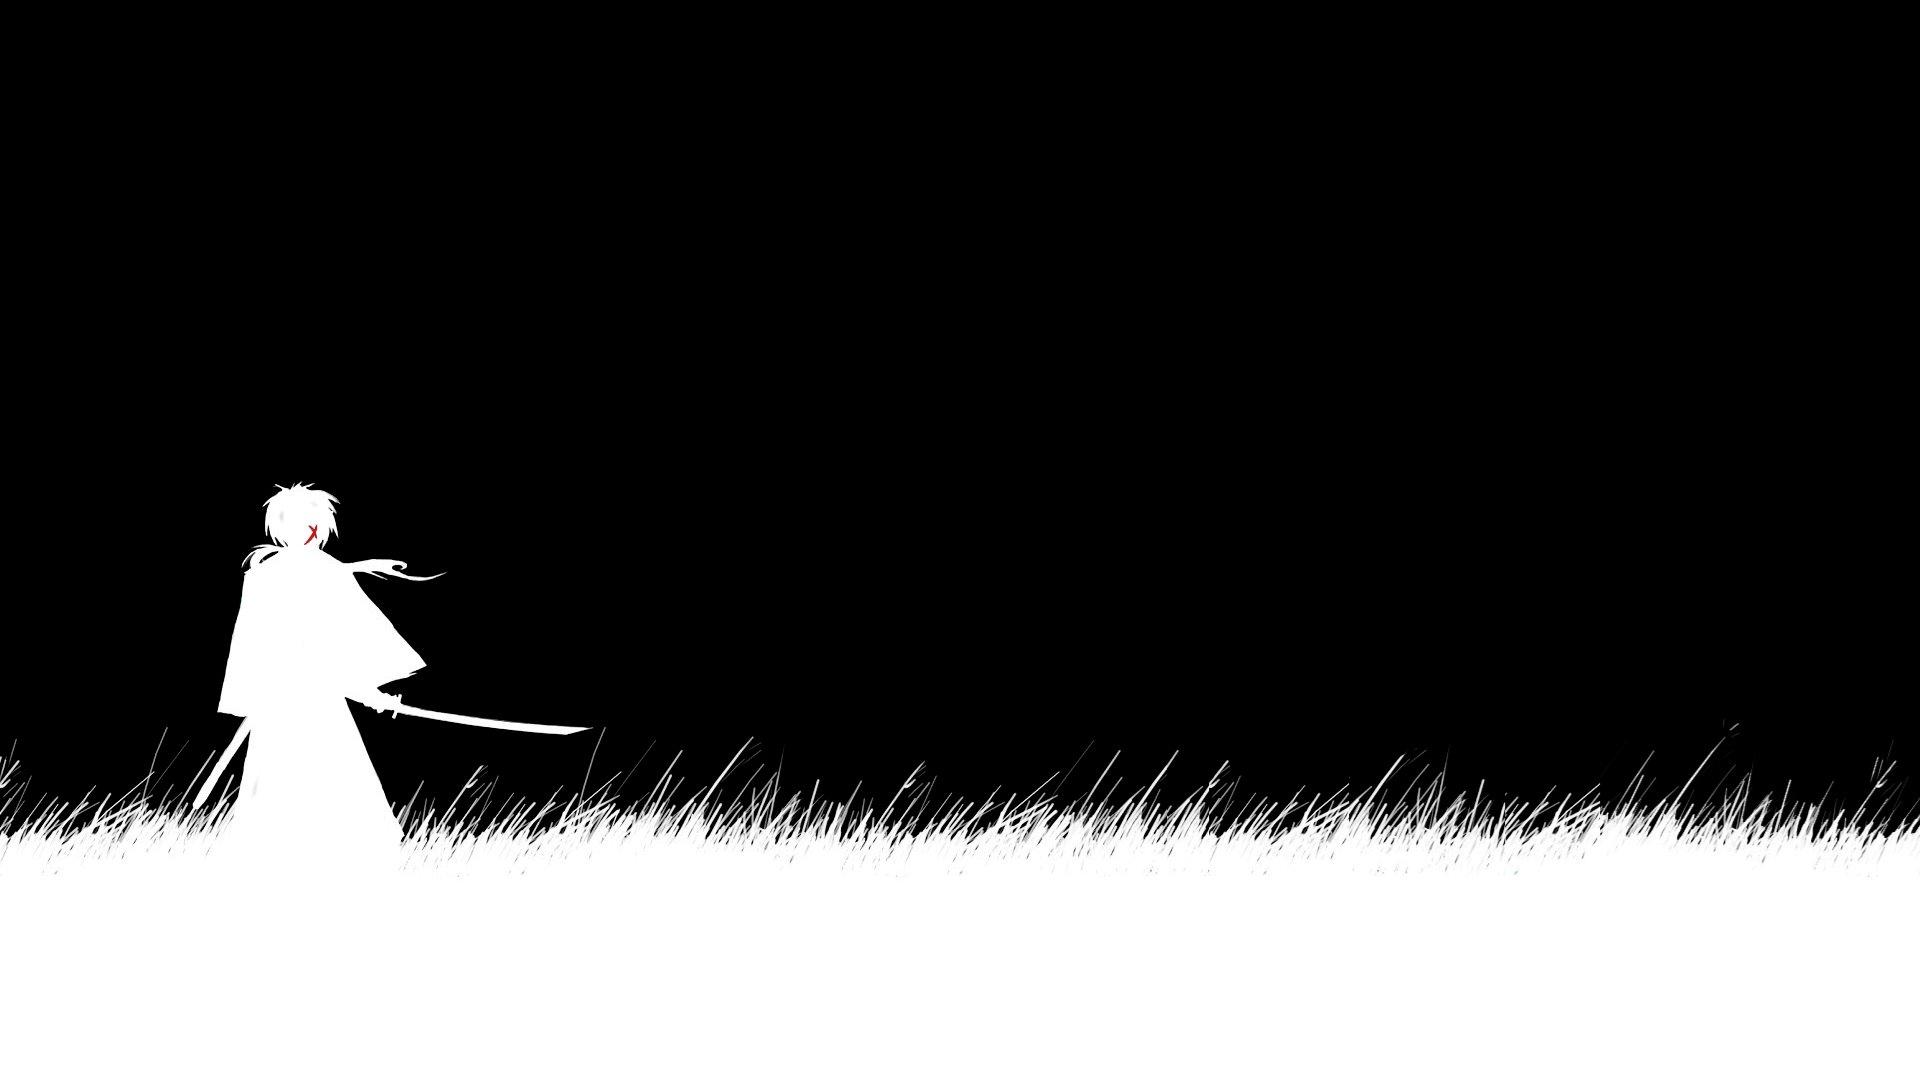 Black and white samurai x anime wallpapers pict desktop - Anime wallpaper black background ...